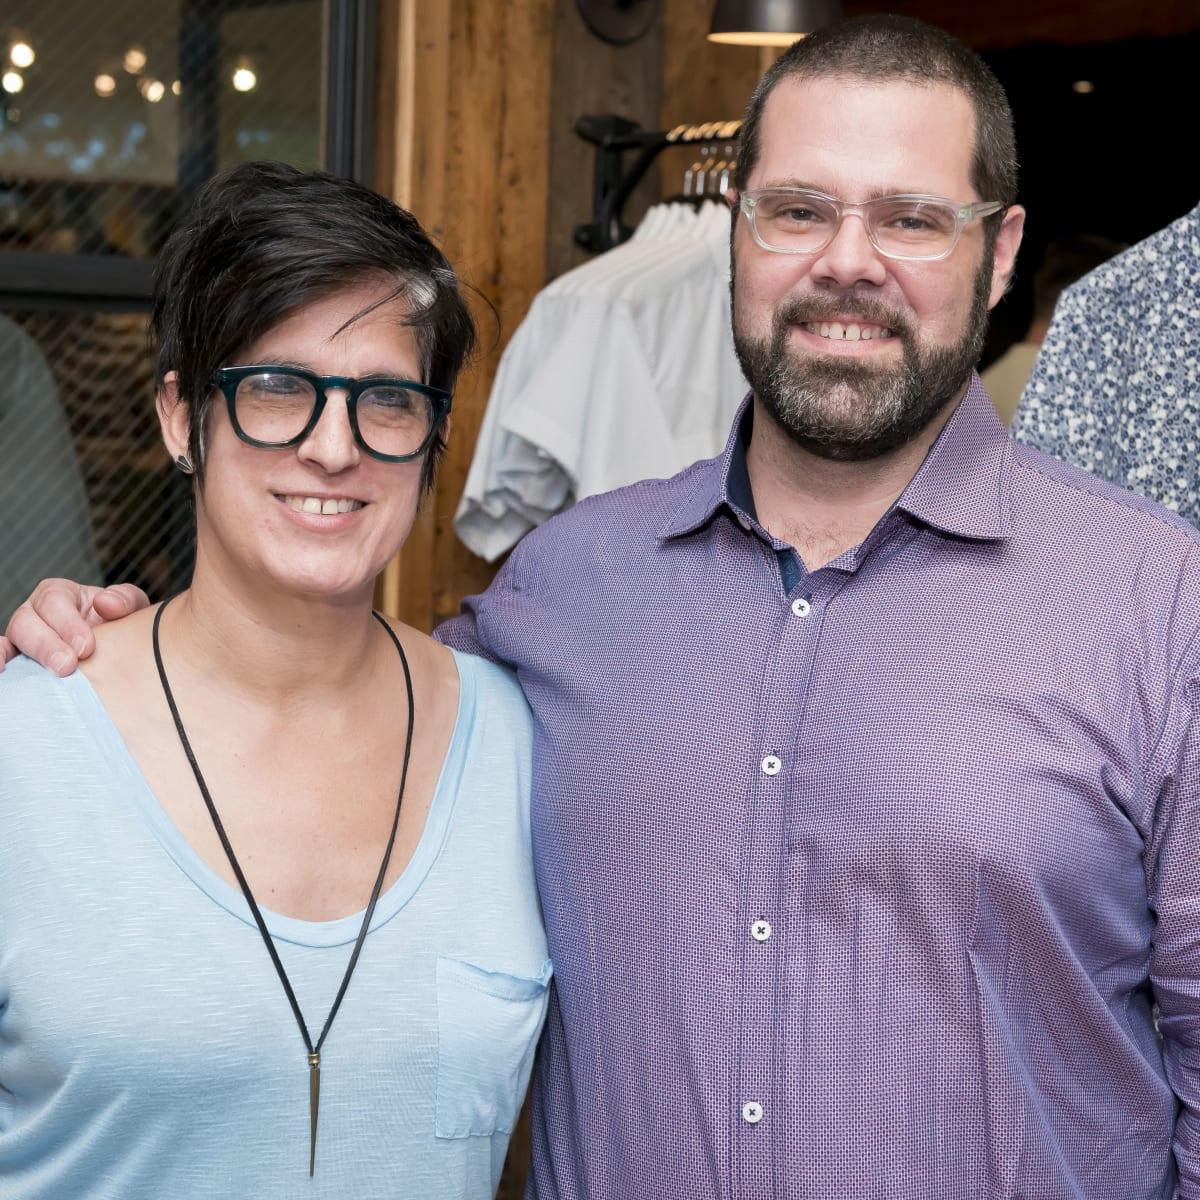 Houston, Stag Provisions opening party, June 2015, Celeste Tammariello, Jose Solis